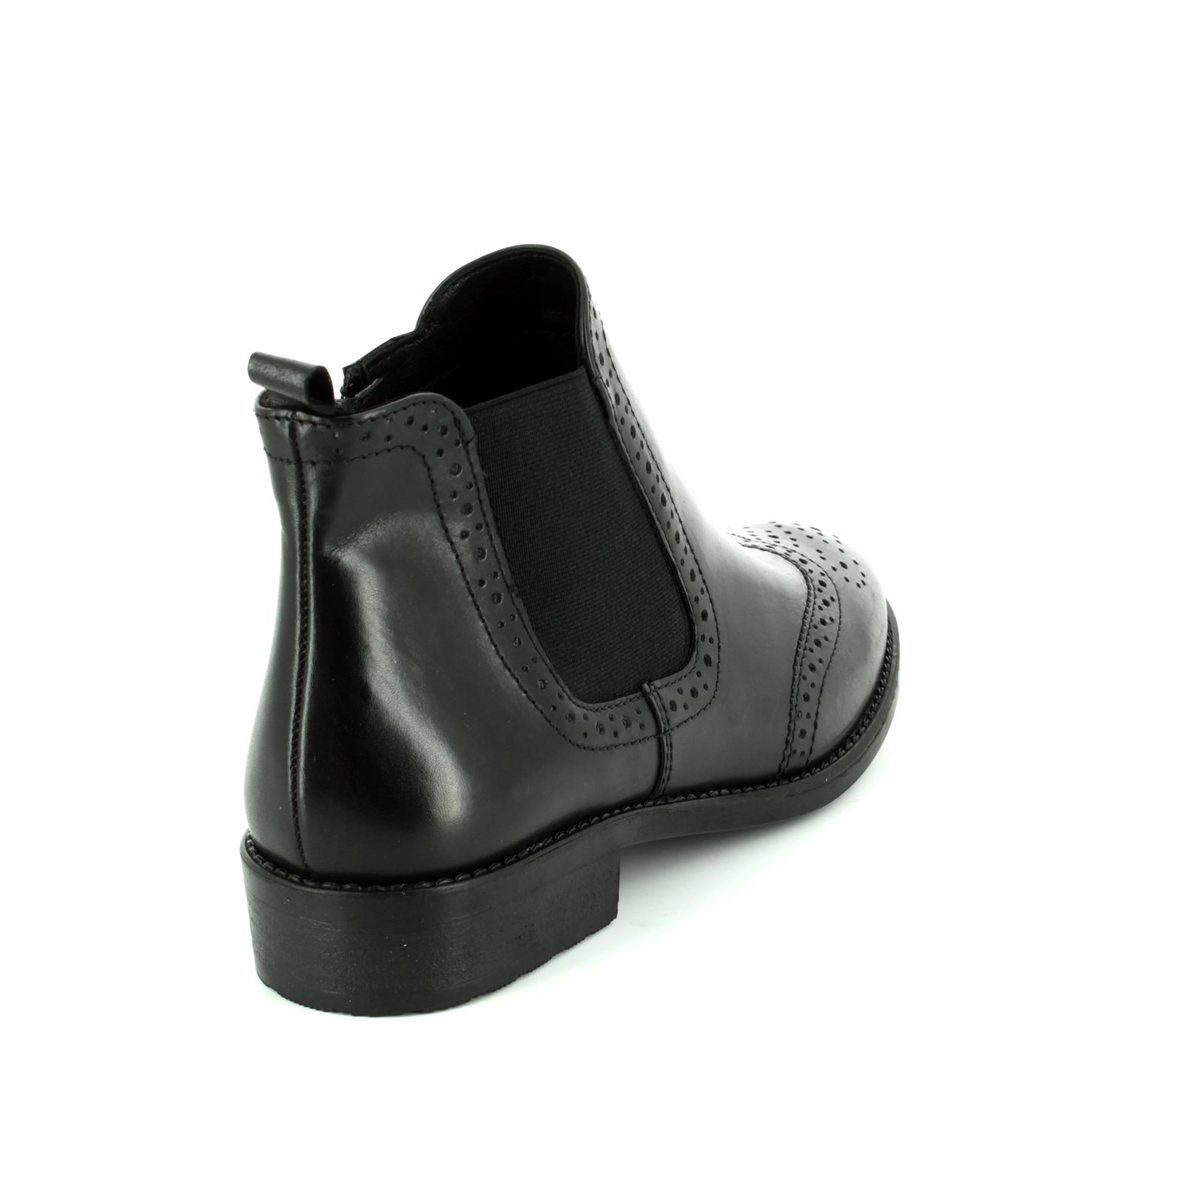 tamaris taina 25493 003 black chelsea boots. Black Bedroom Furniture Sets. Home Design Ideas